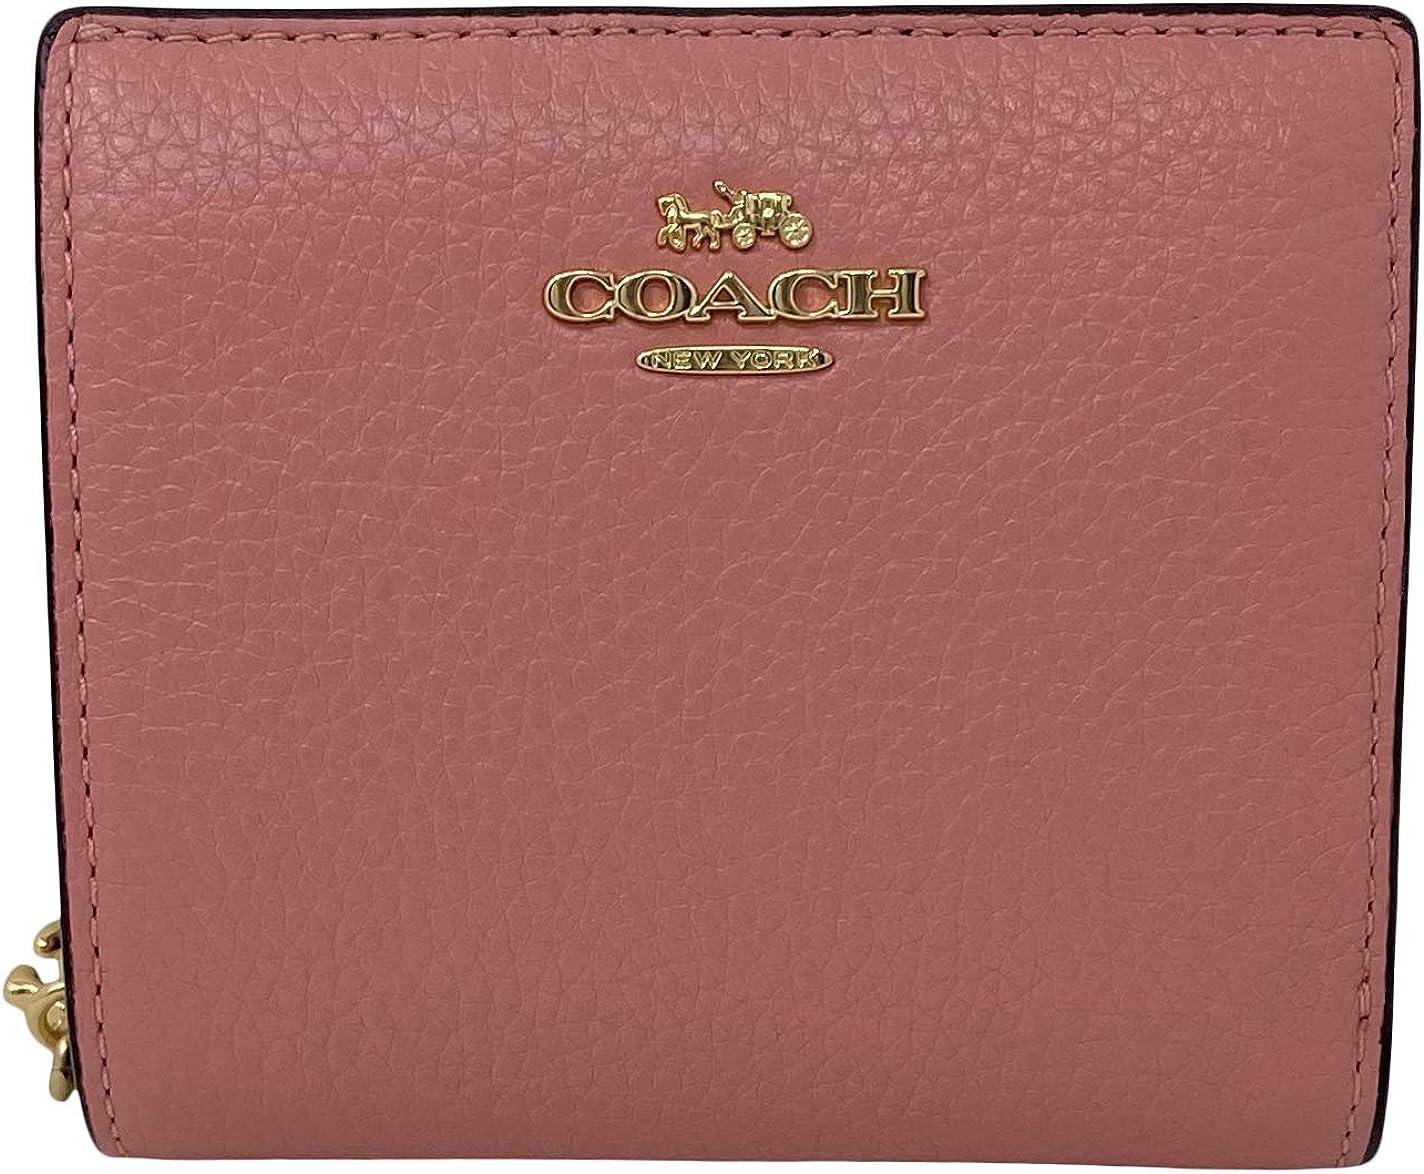 Coach Pebble Leather Snap Wallet Light Blush